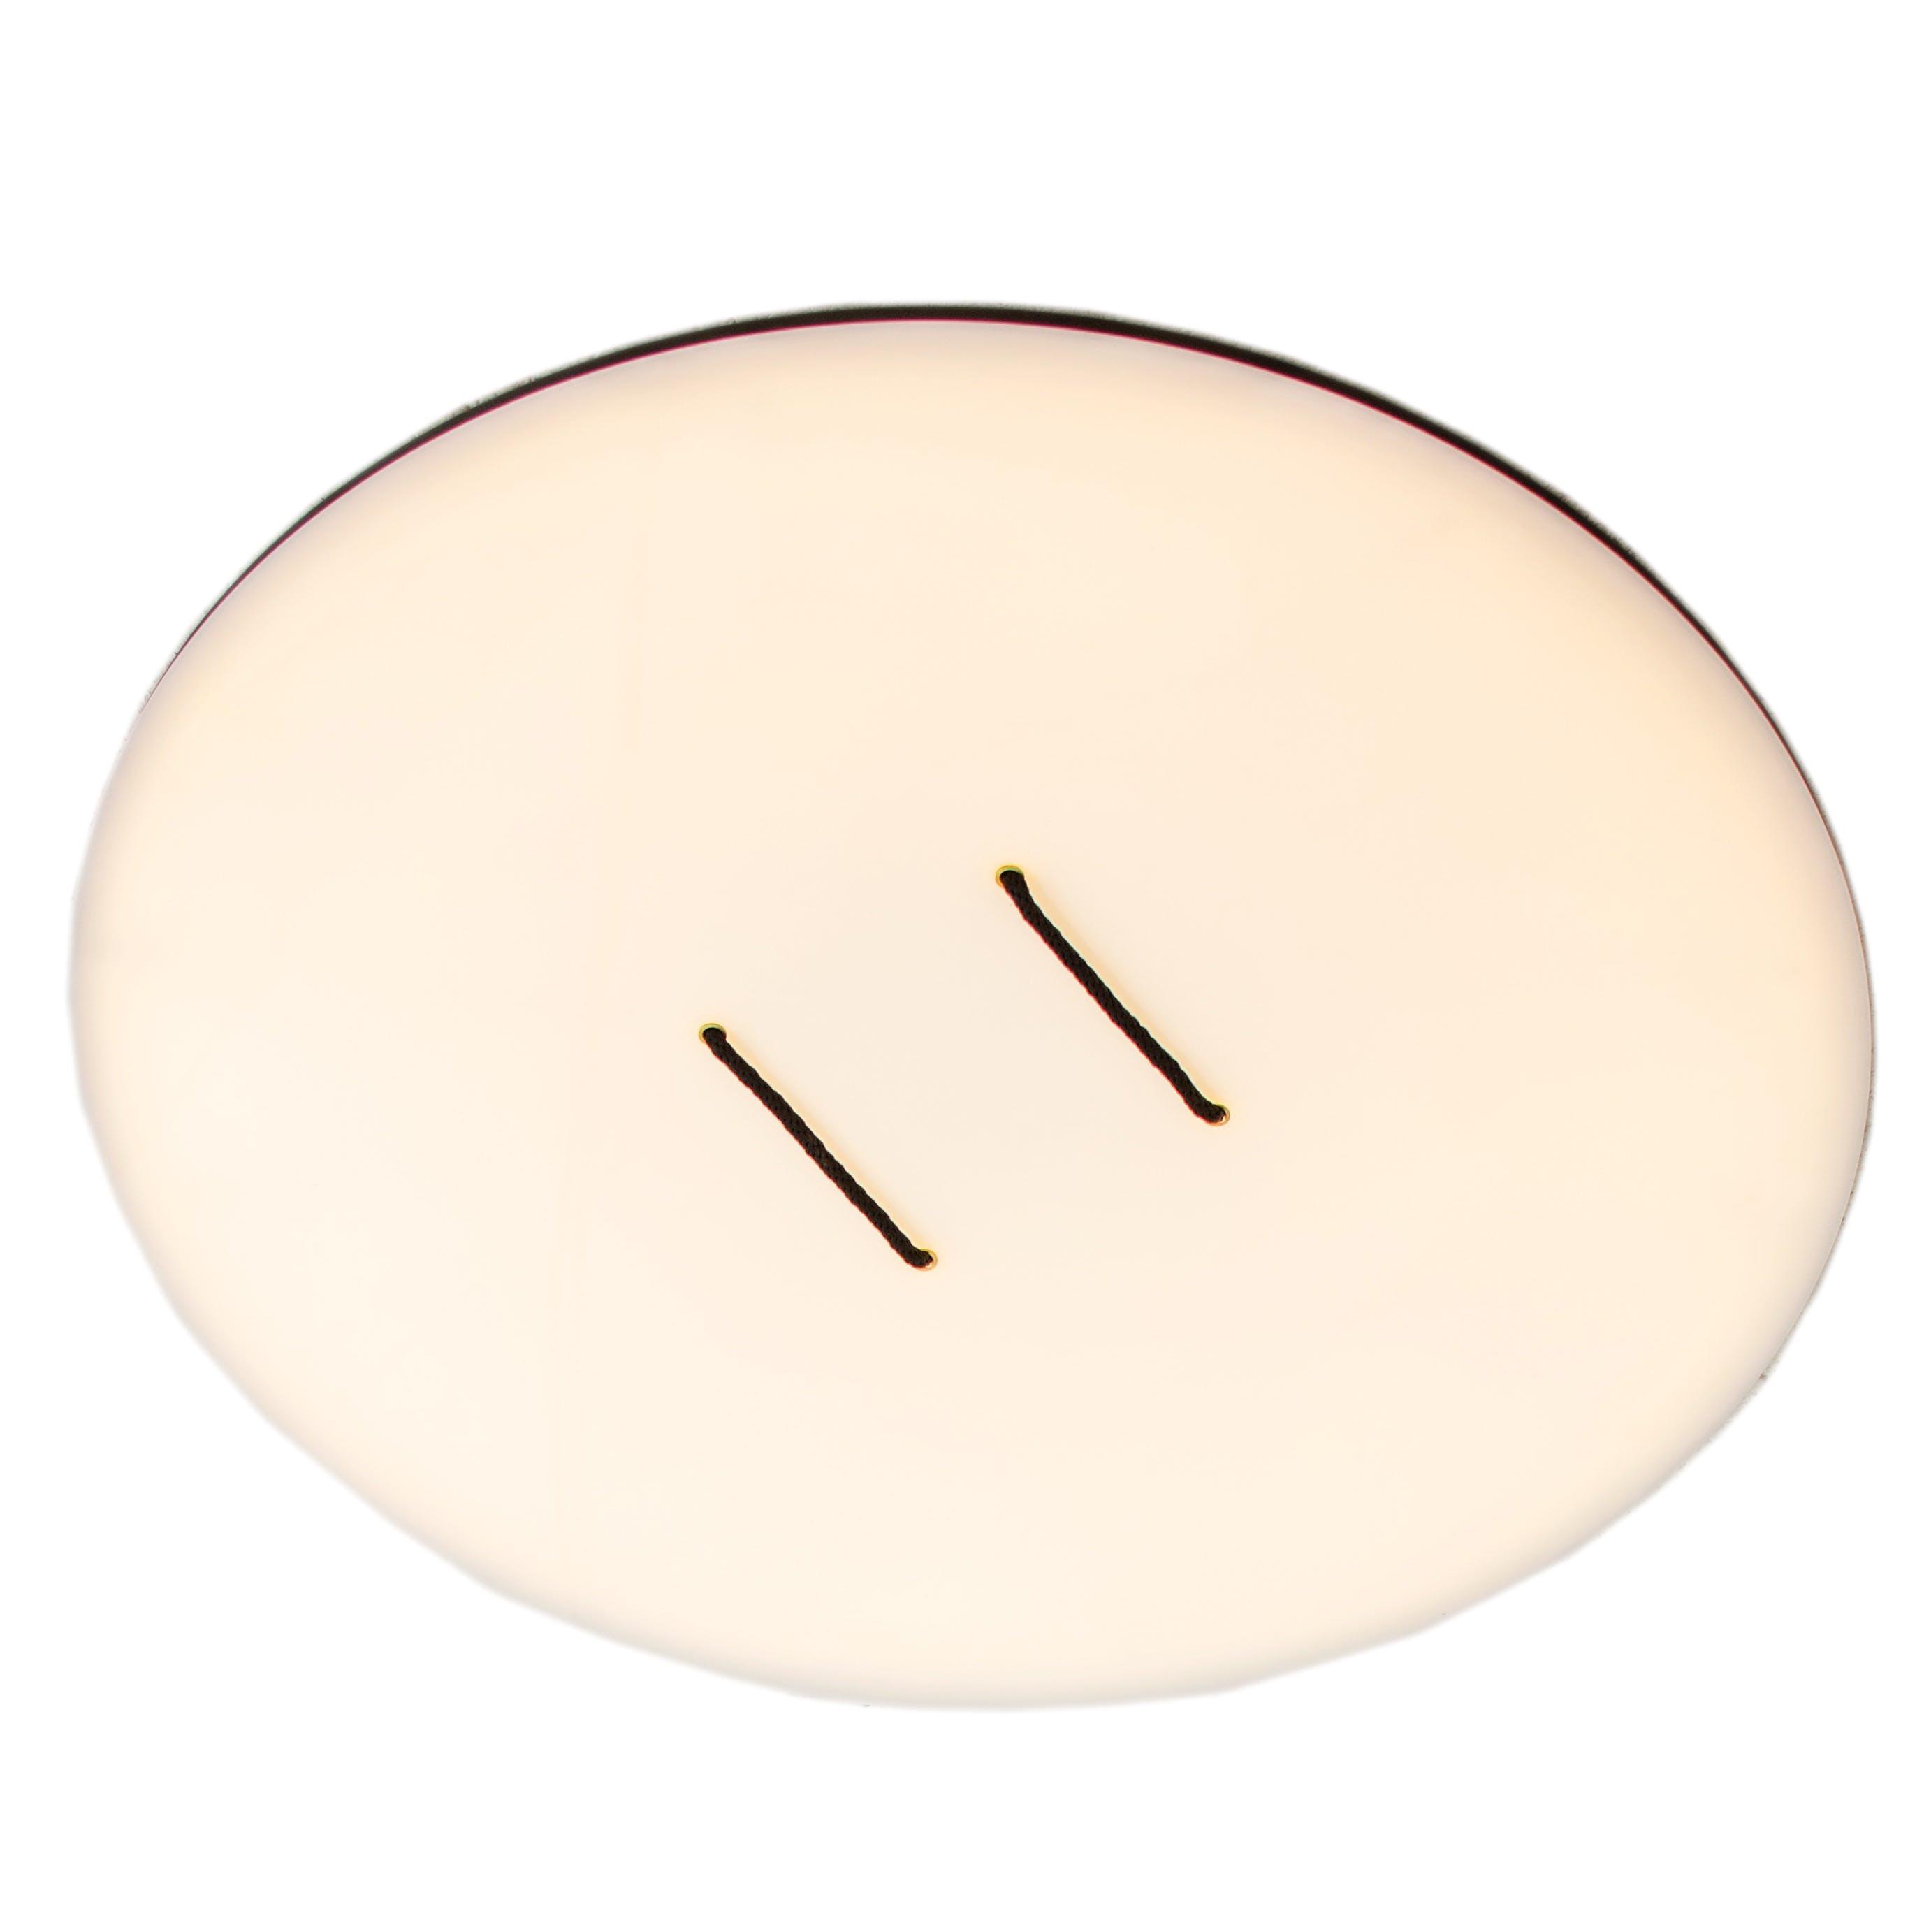 Andlight Button 60 Ceiling Wall Light Haute Living Thumbnail